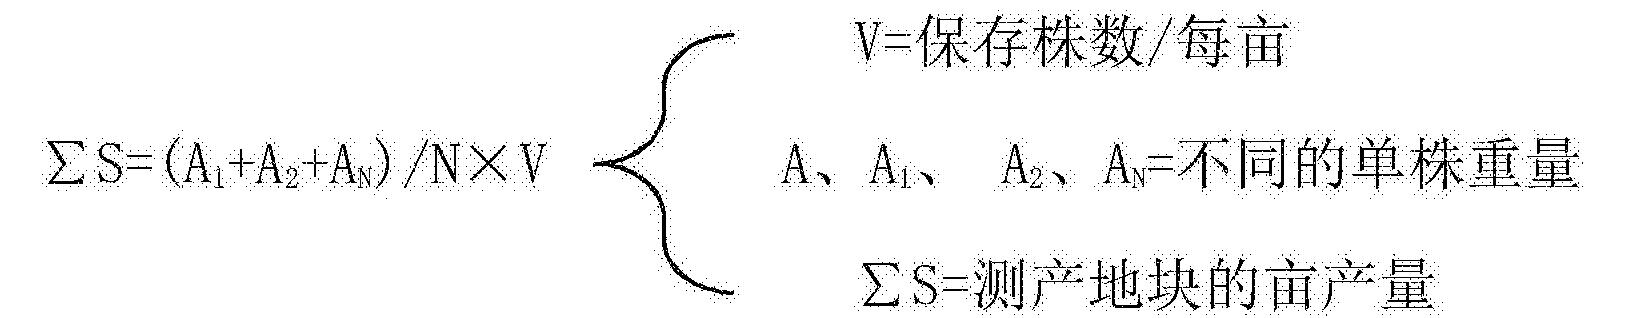 Figure CN106613754AD00073